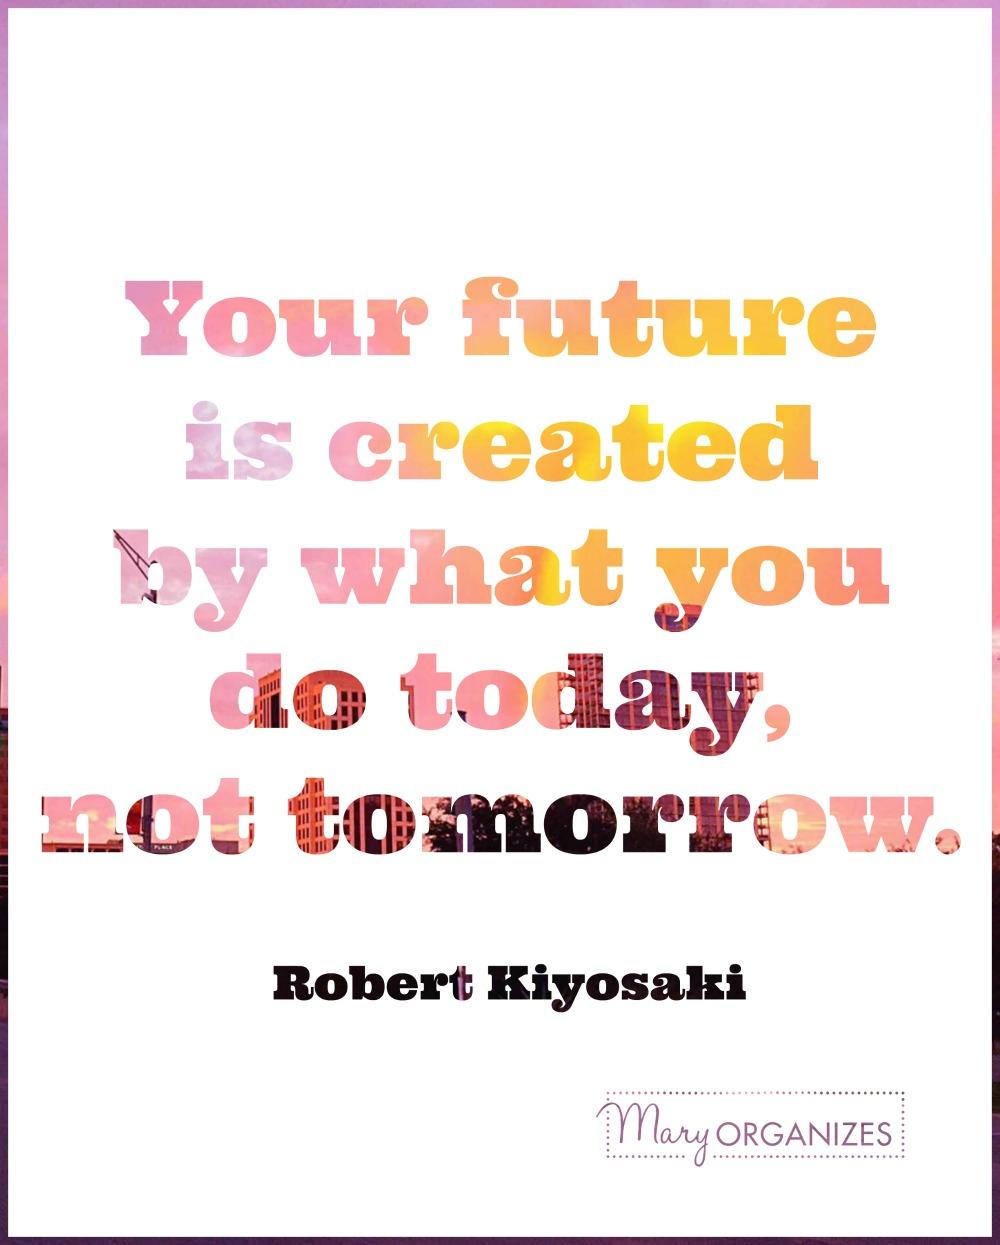 maryorganizes-your-future-is-created-by-what-you-do-today-not-tomorrow-robert-kiyosaki